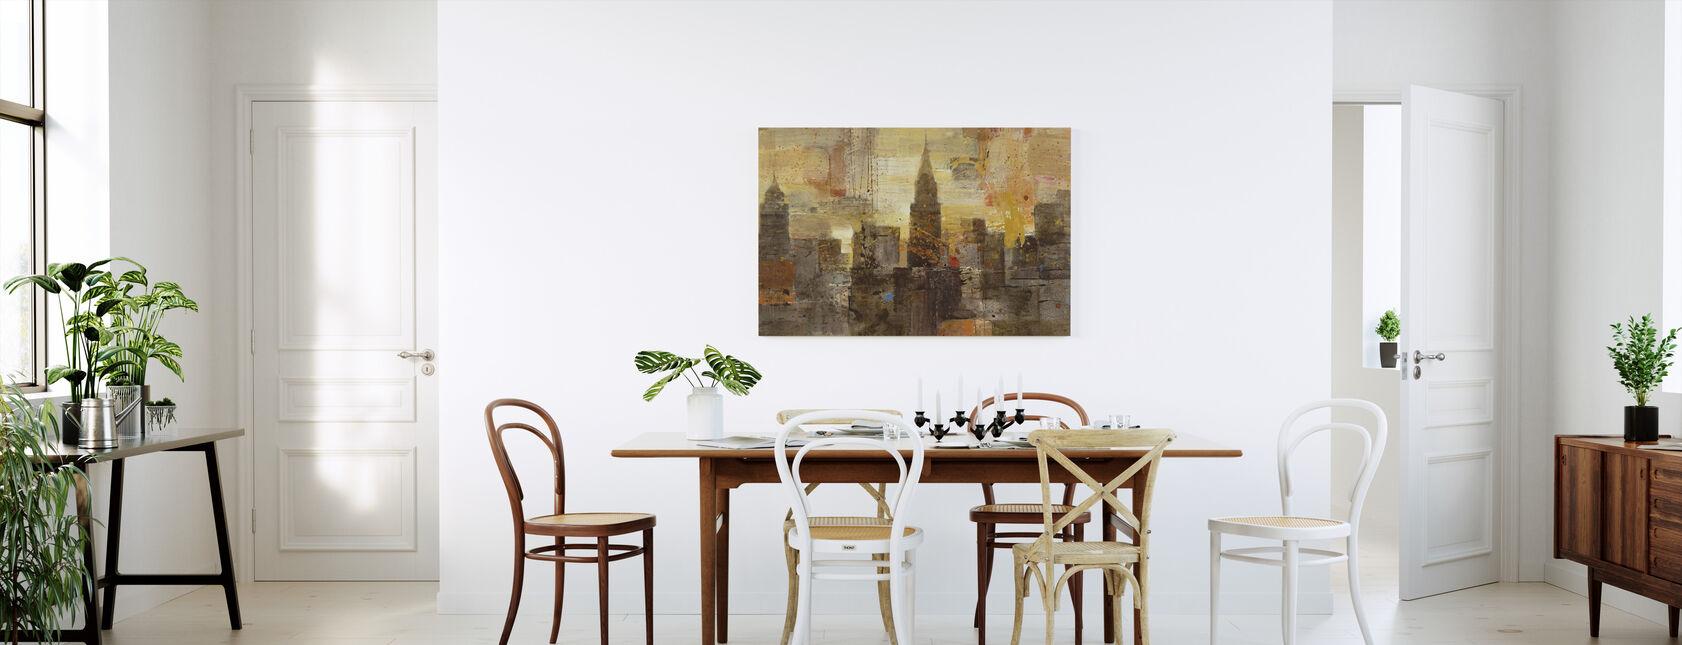 Vuurwerk - Canvas print - Keuken